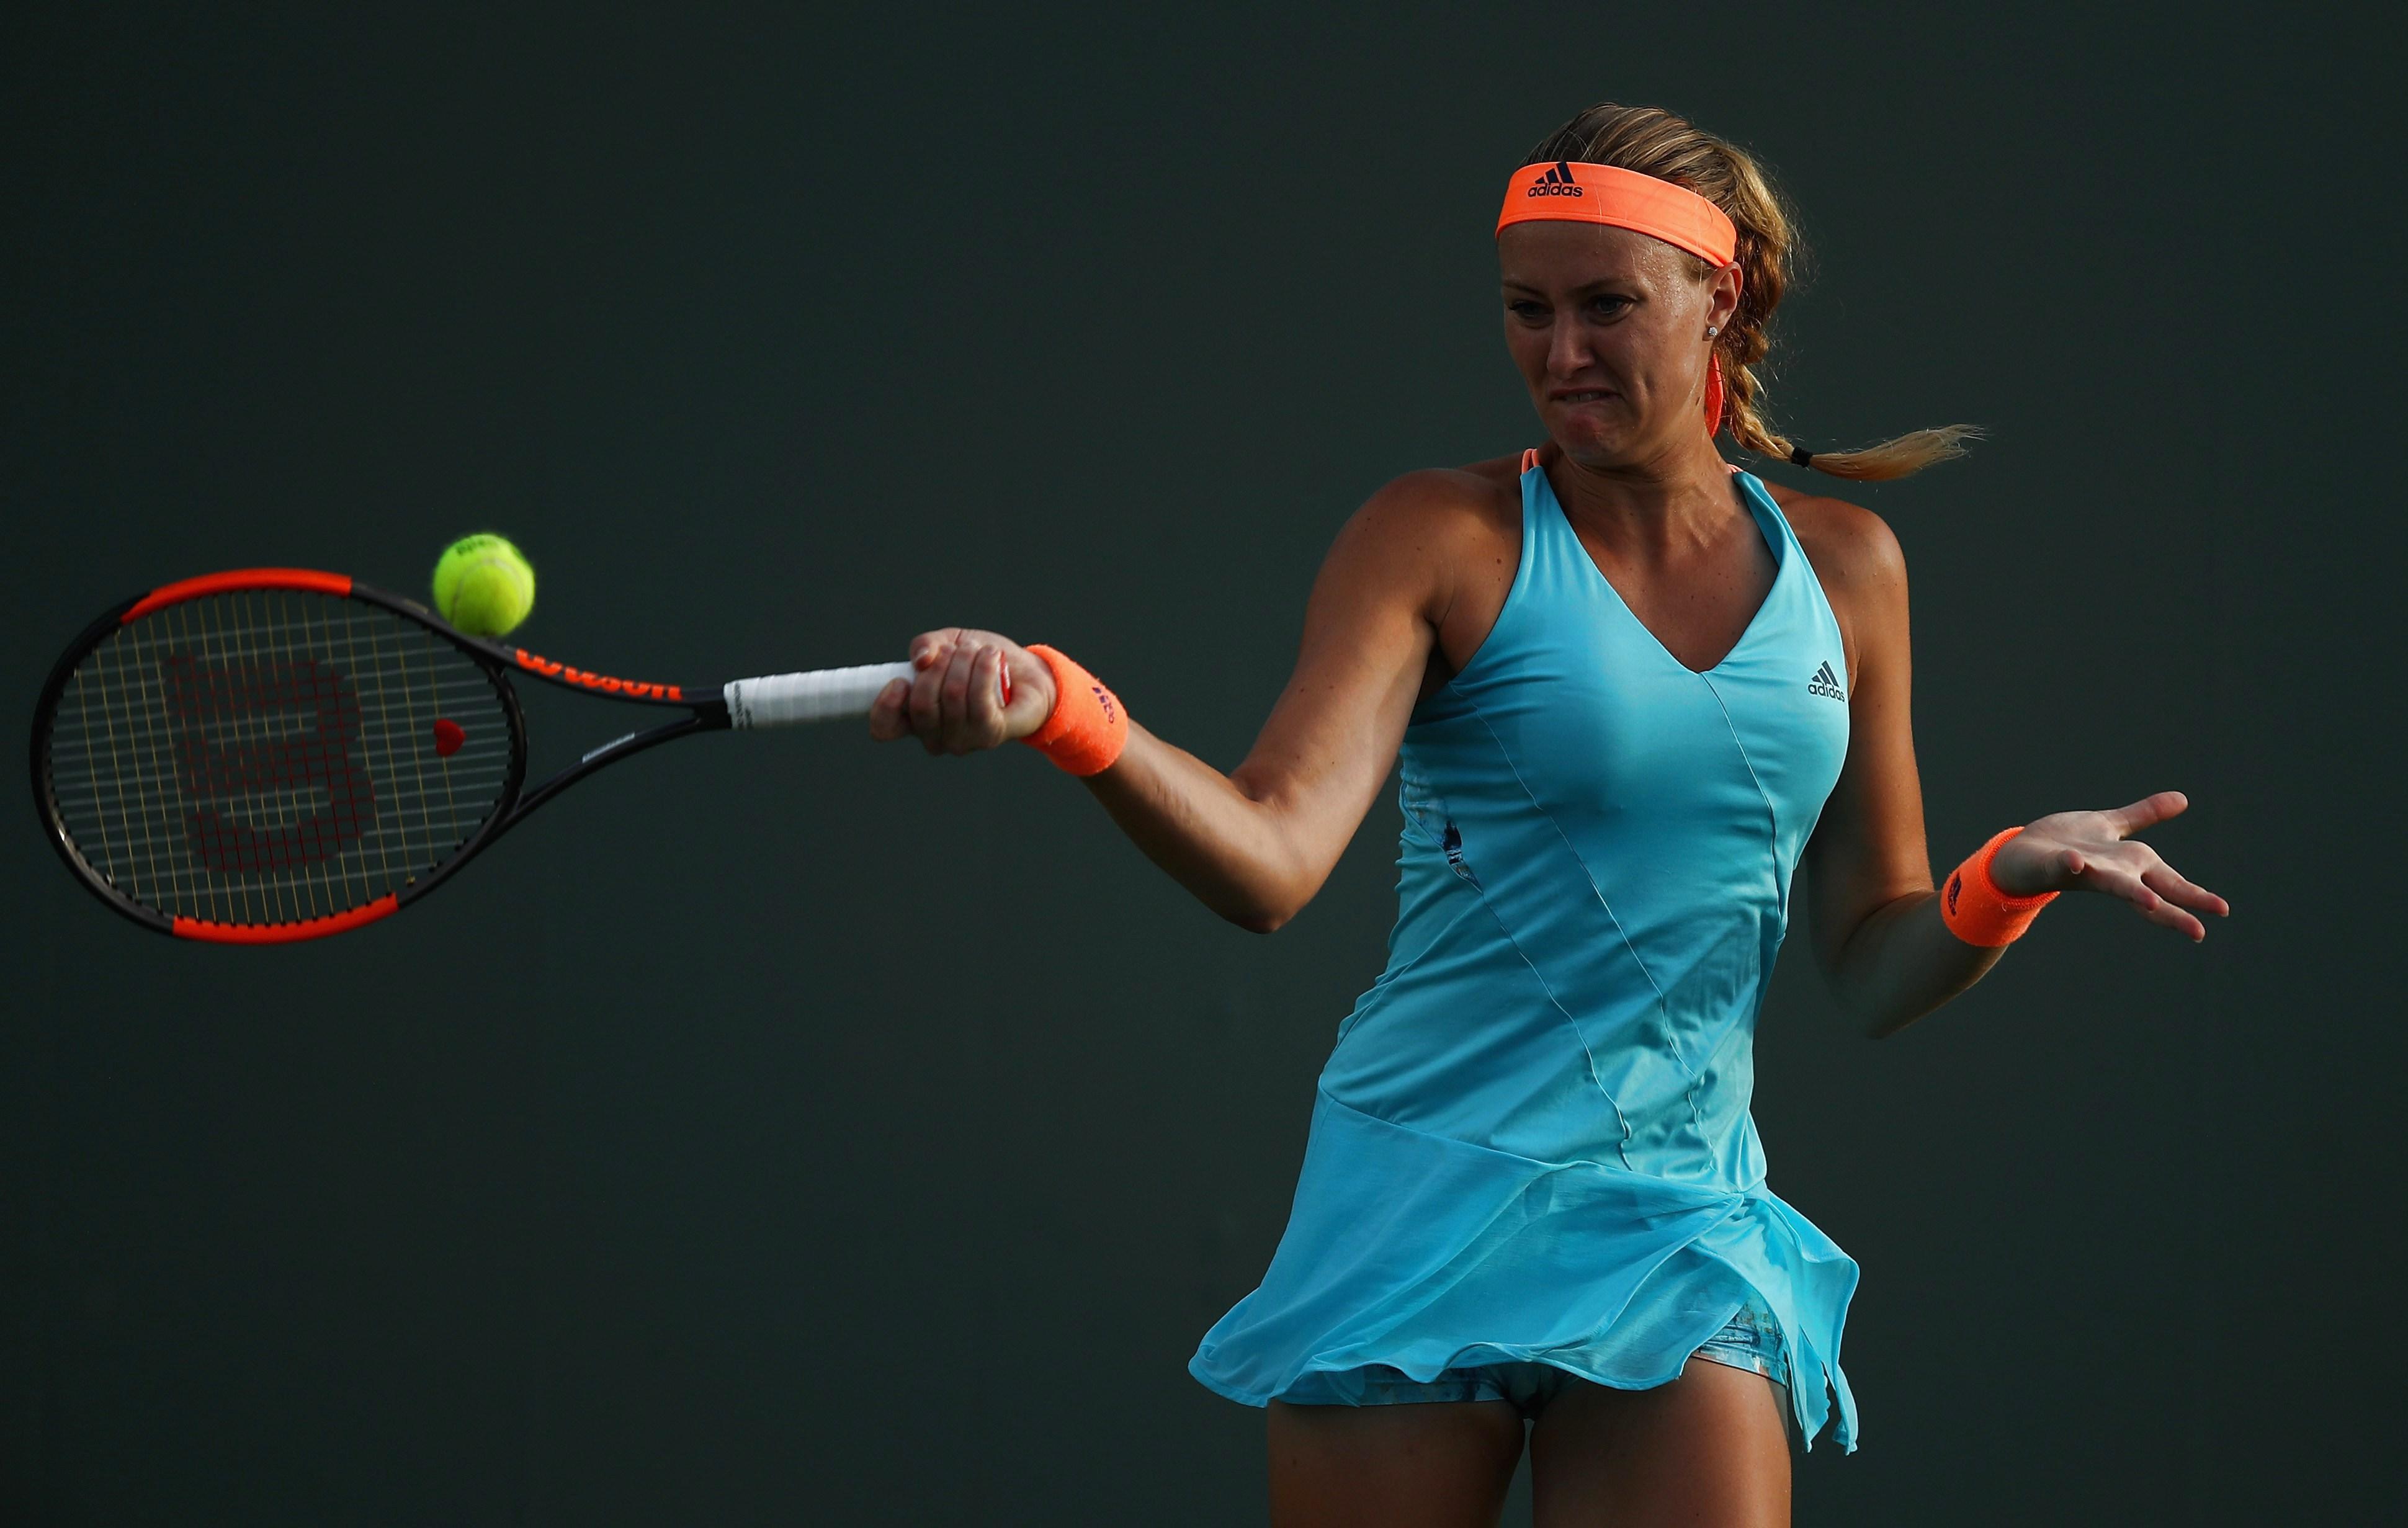 Tennis - WTA - Miami : Mladenovic retombe sur terre